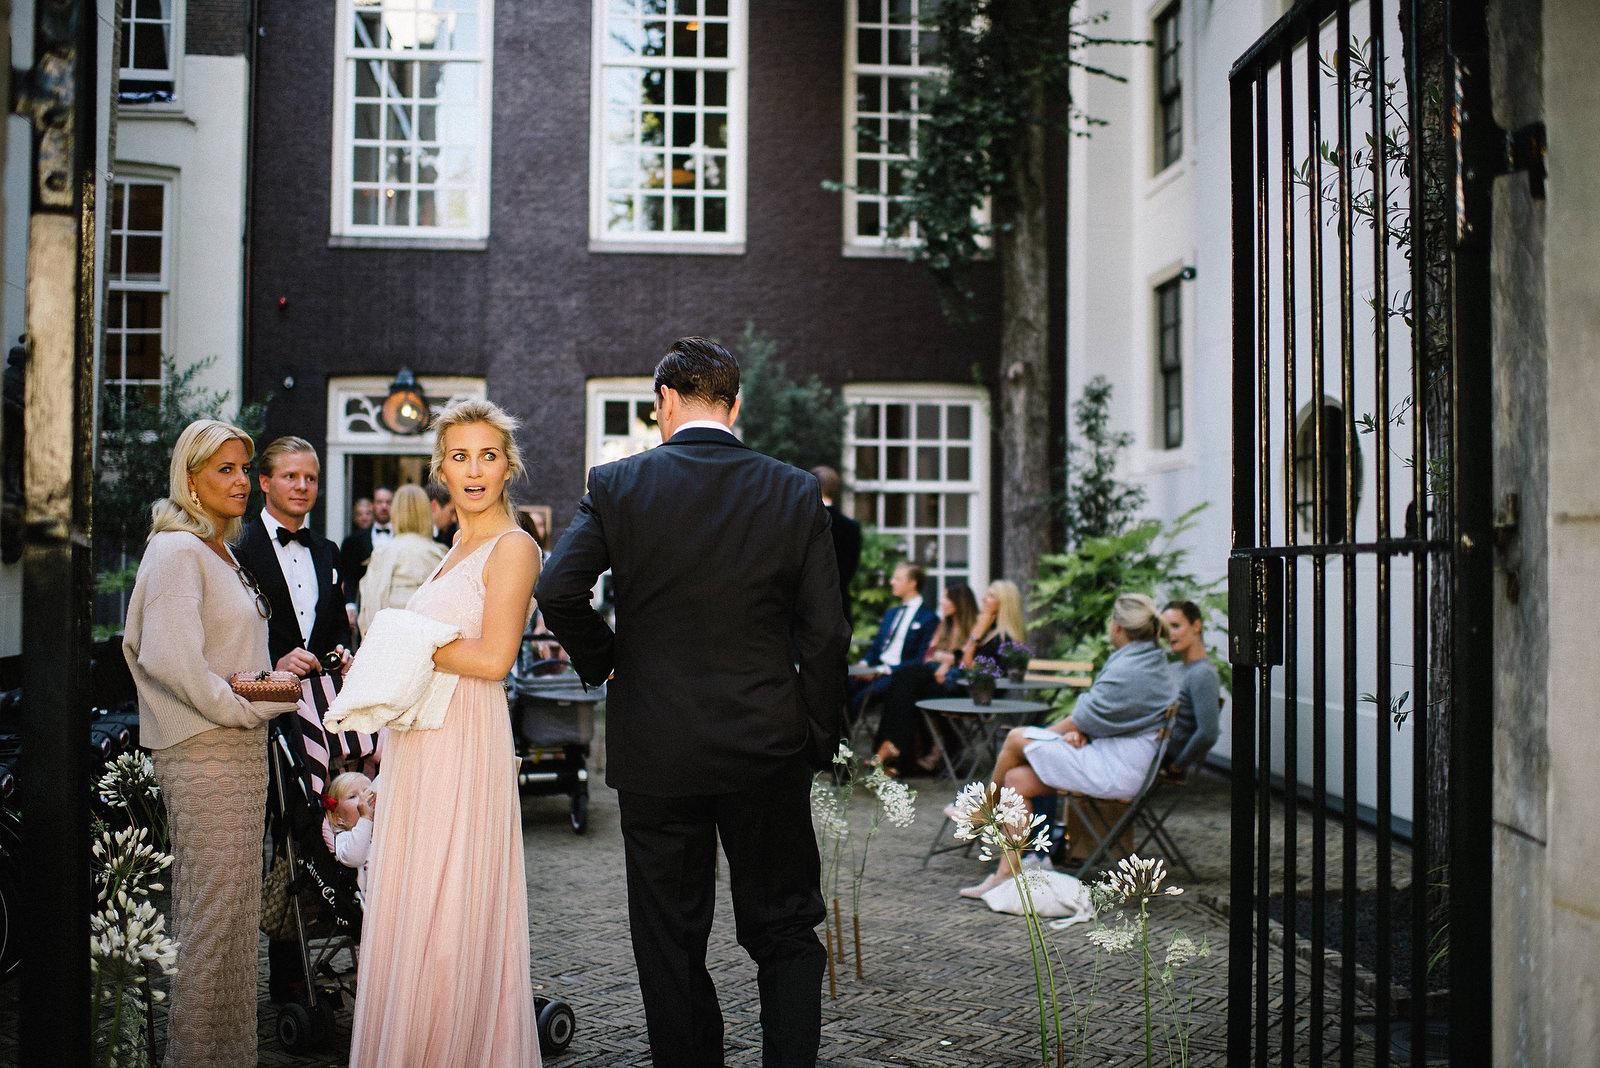 Fotograf Konstanz - Destination Wedding Photographer Amsterdam 089 - Destination Wedding Amsterdam  - 194 -